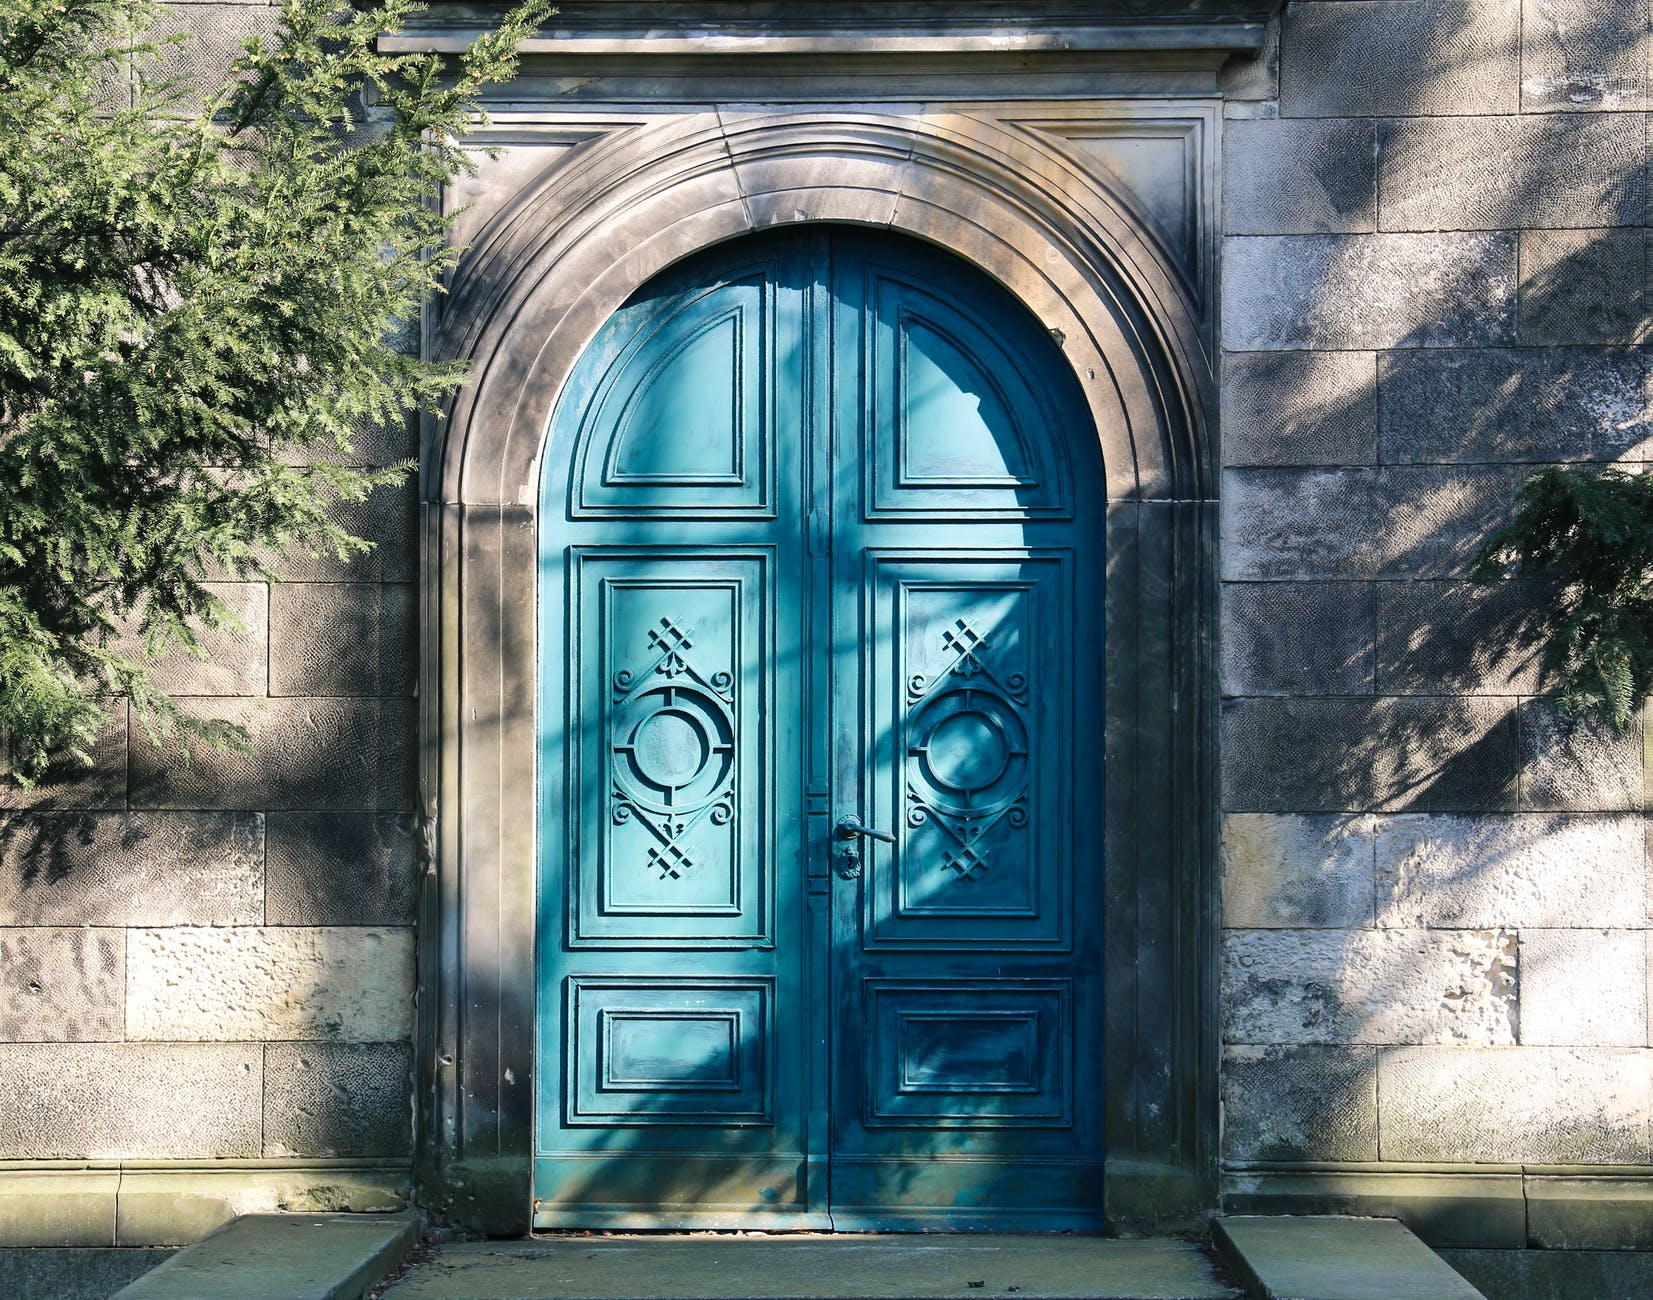 arch architecture art blue